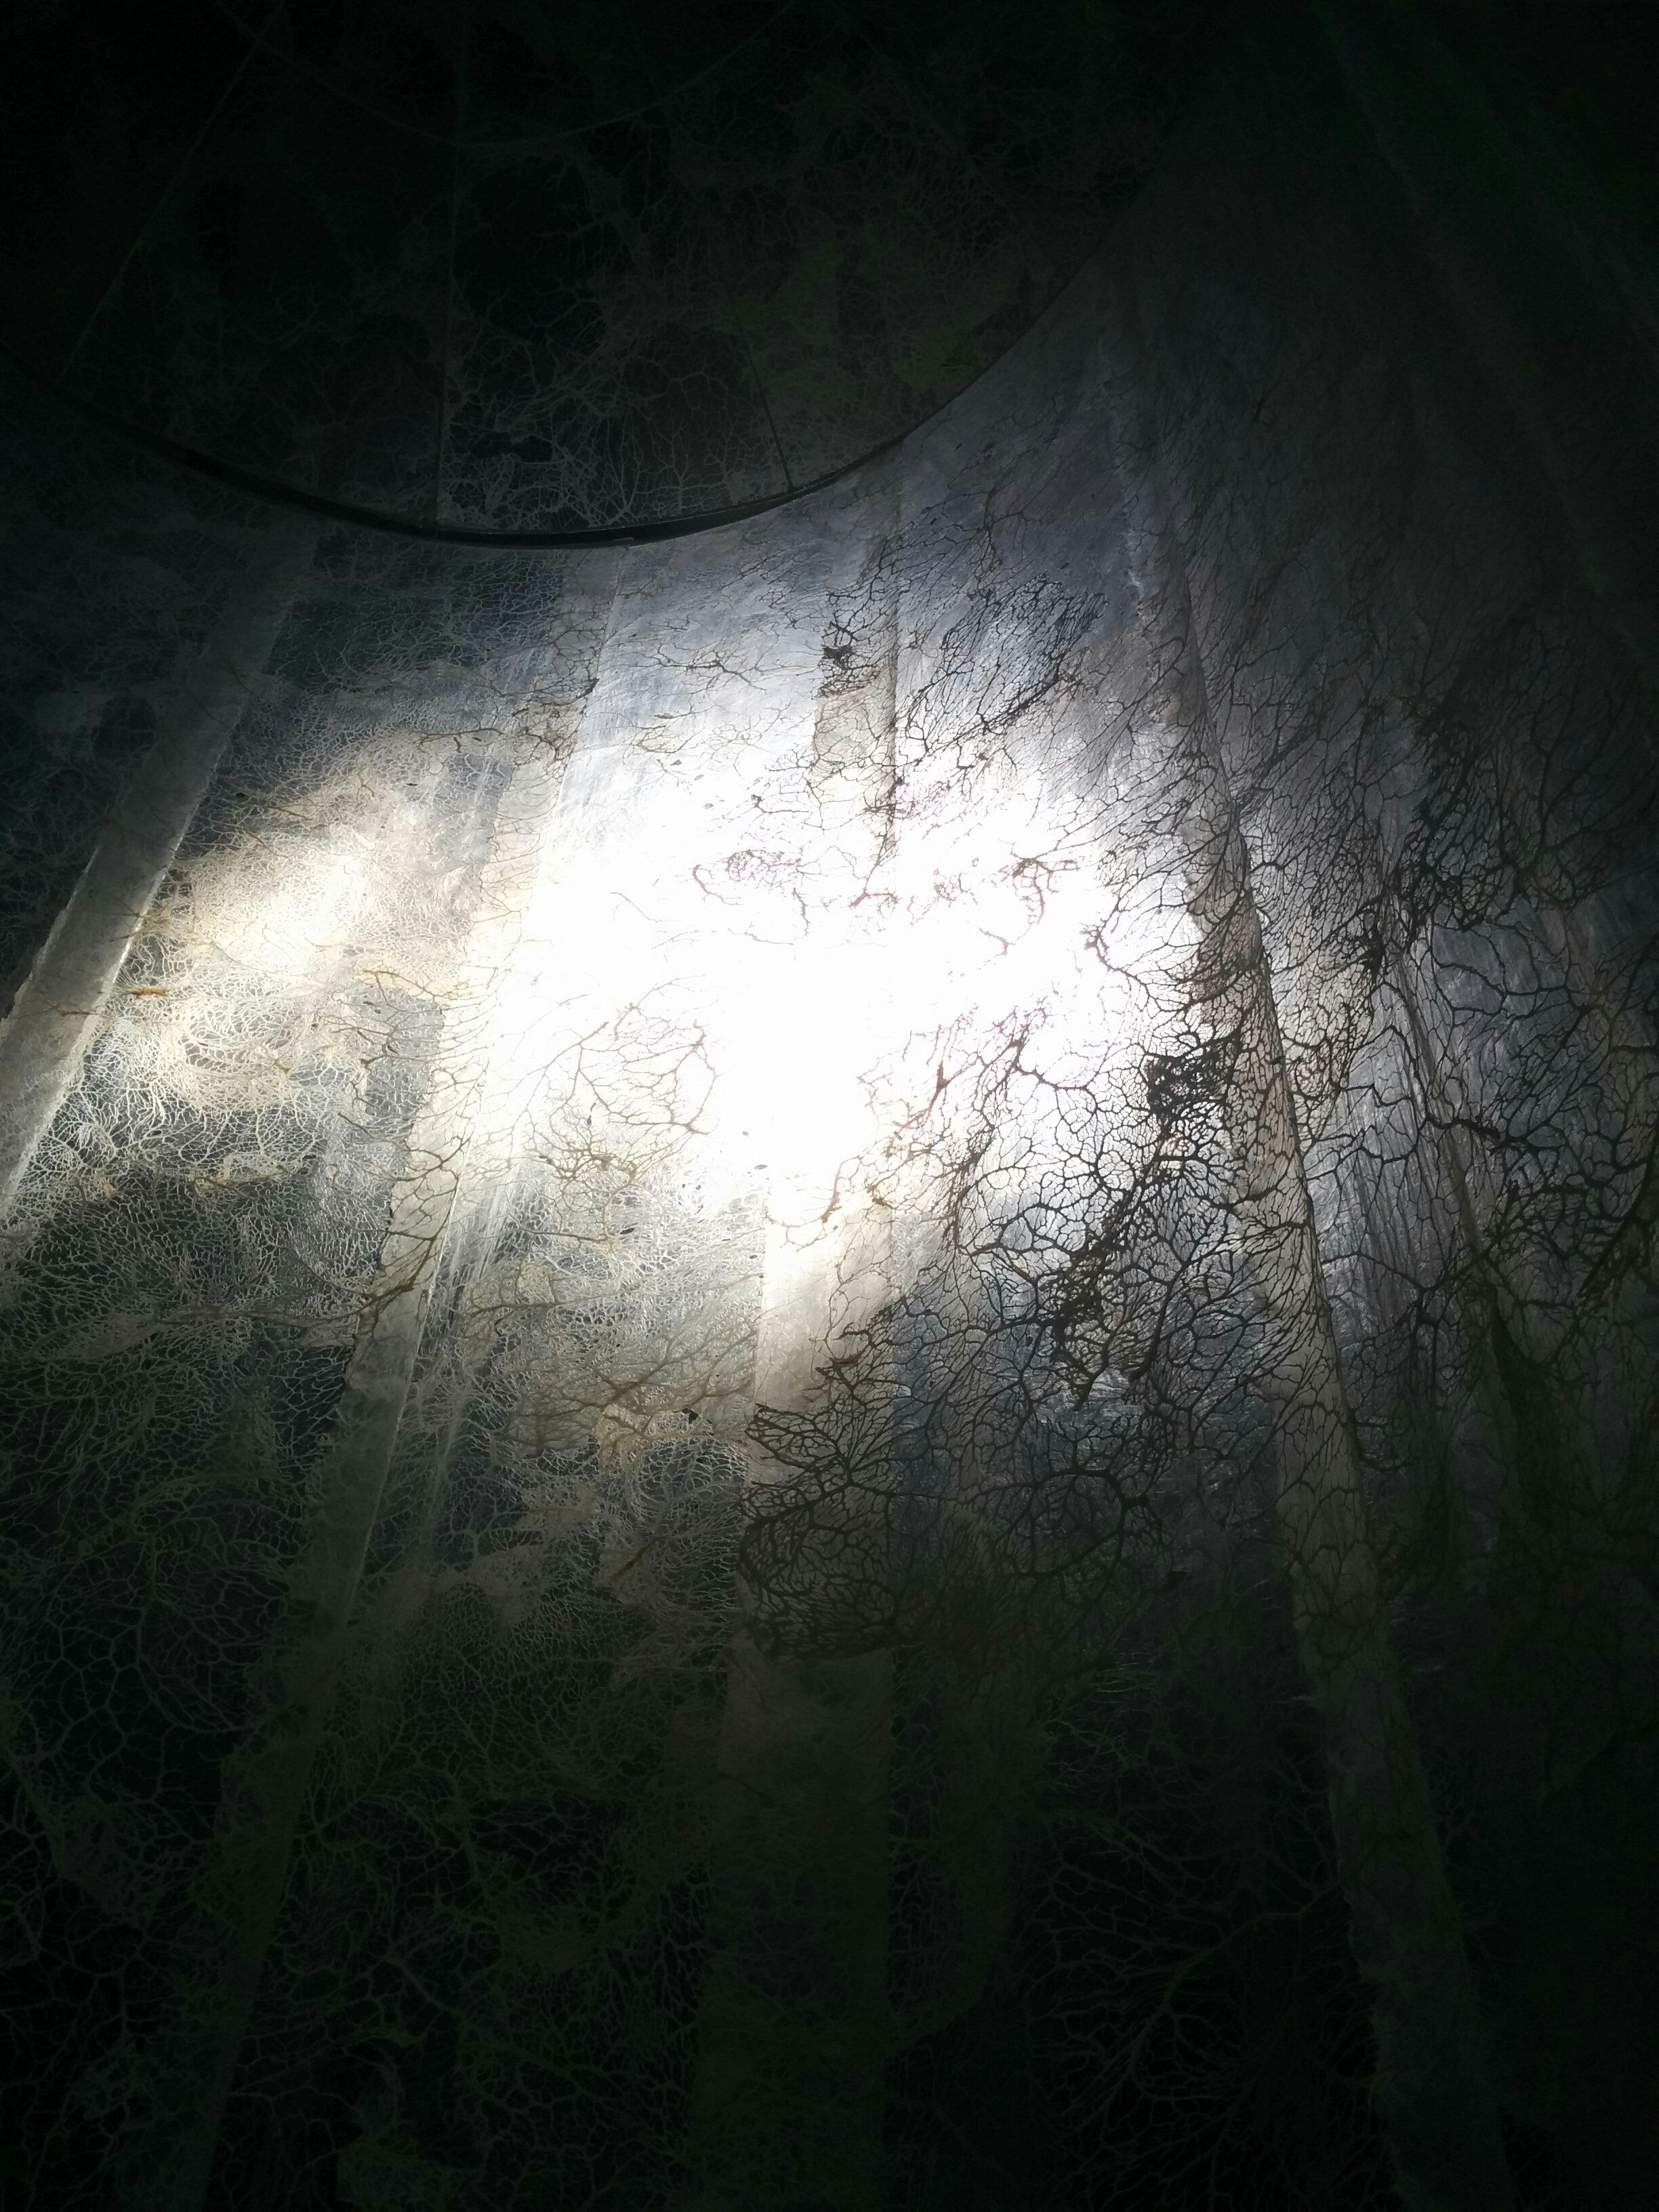 Elpida Hadzi-Vasileva, Fragility (Detail showing light)